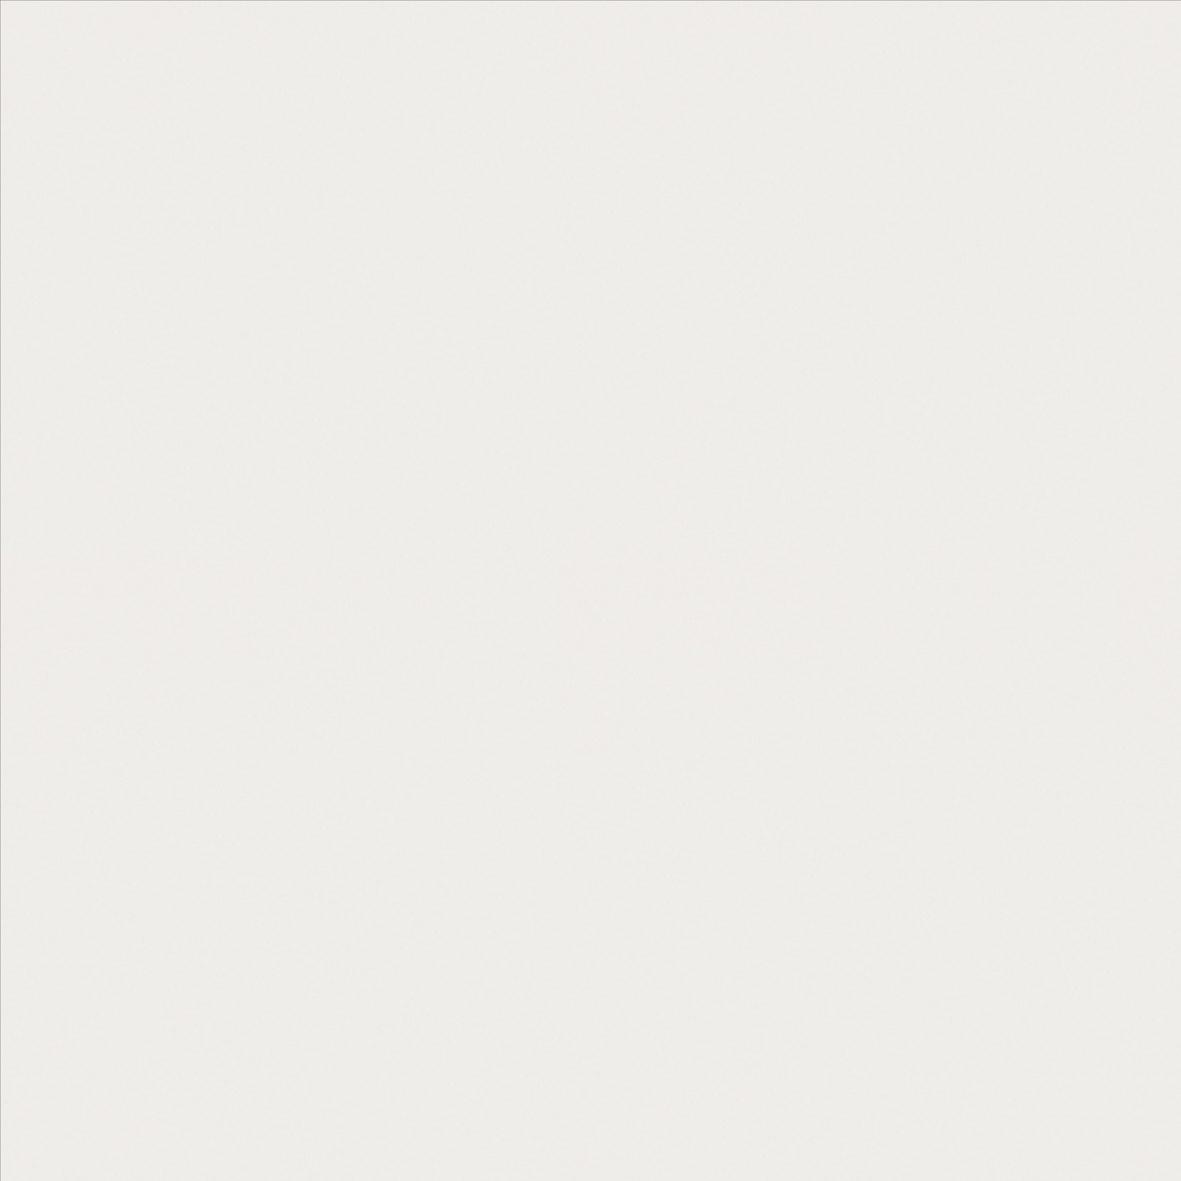 Roller_Swatch_Palette_White_RE0001